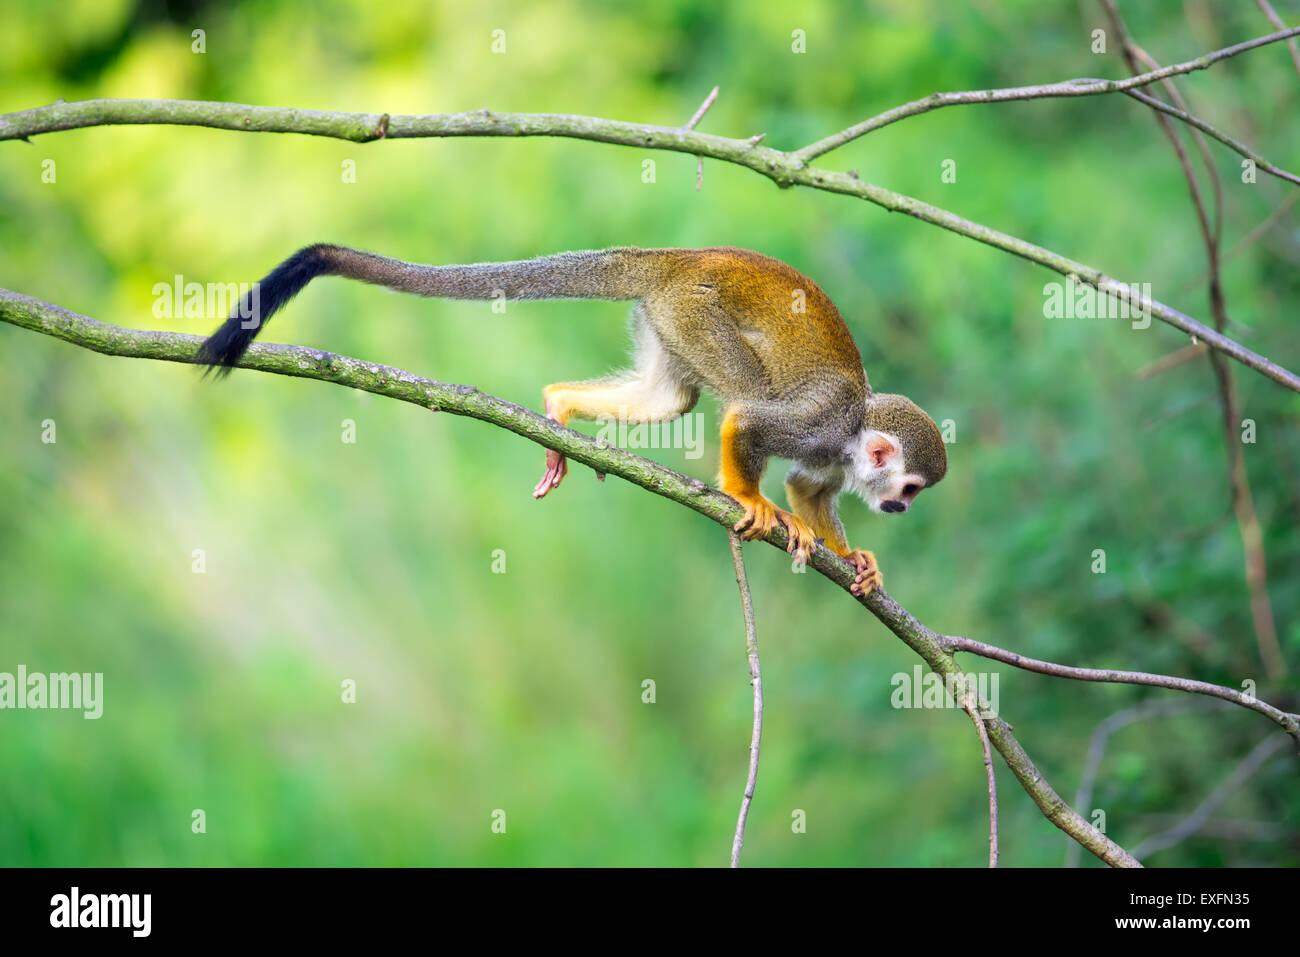 Squirrel monkeys in trees - photo#33